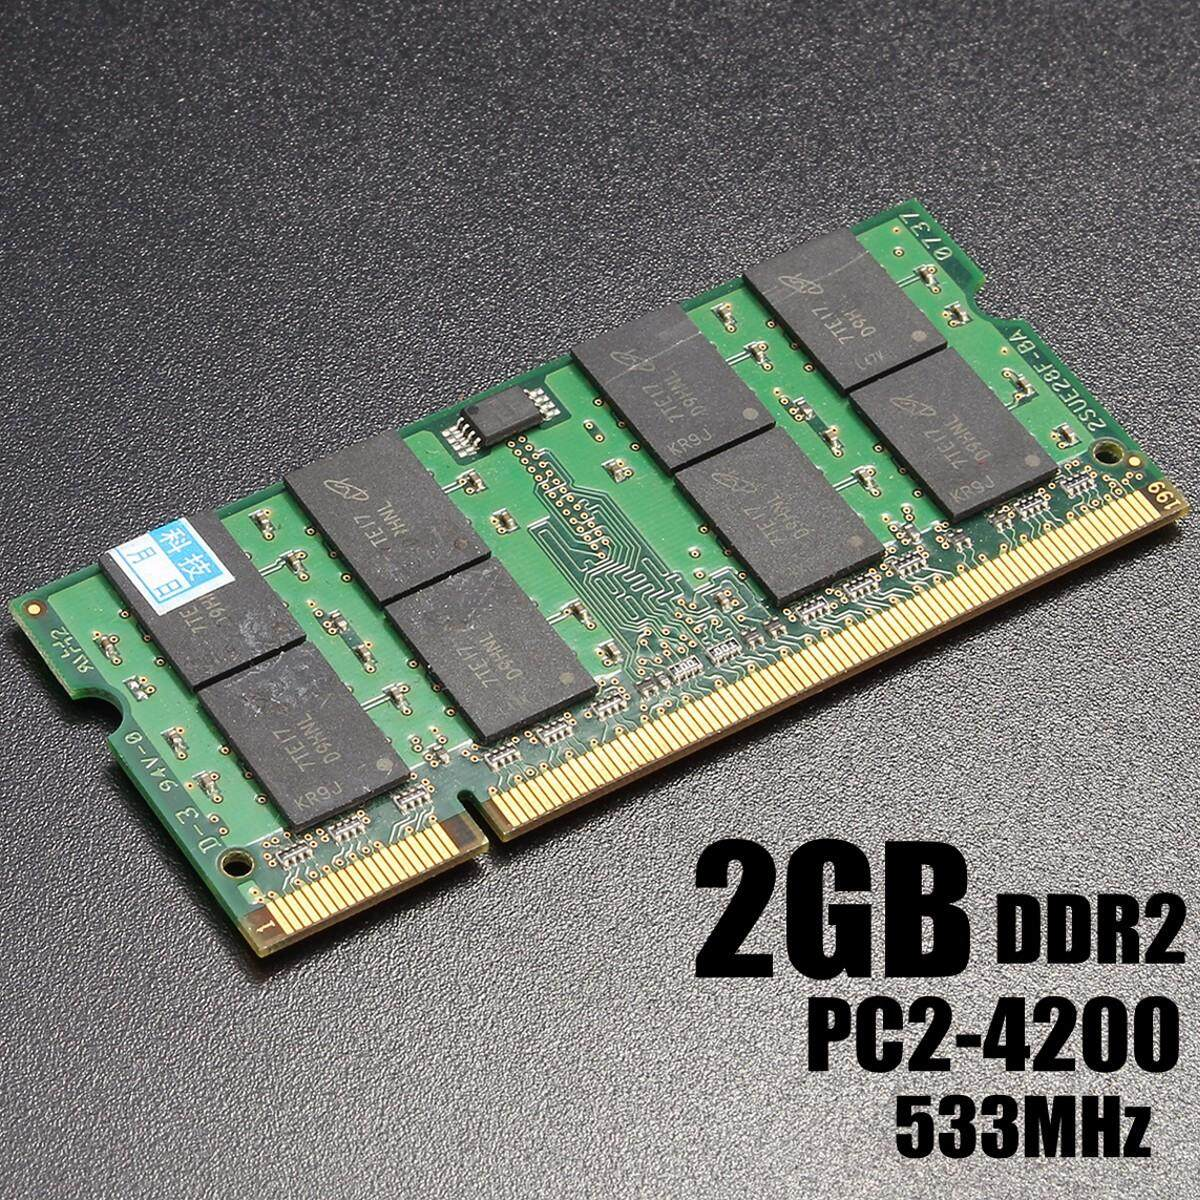 2GB DDR2 PC2-4200 533MHz Non-ECC Notebook Laptop PC DIMM Memory RAM - intl